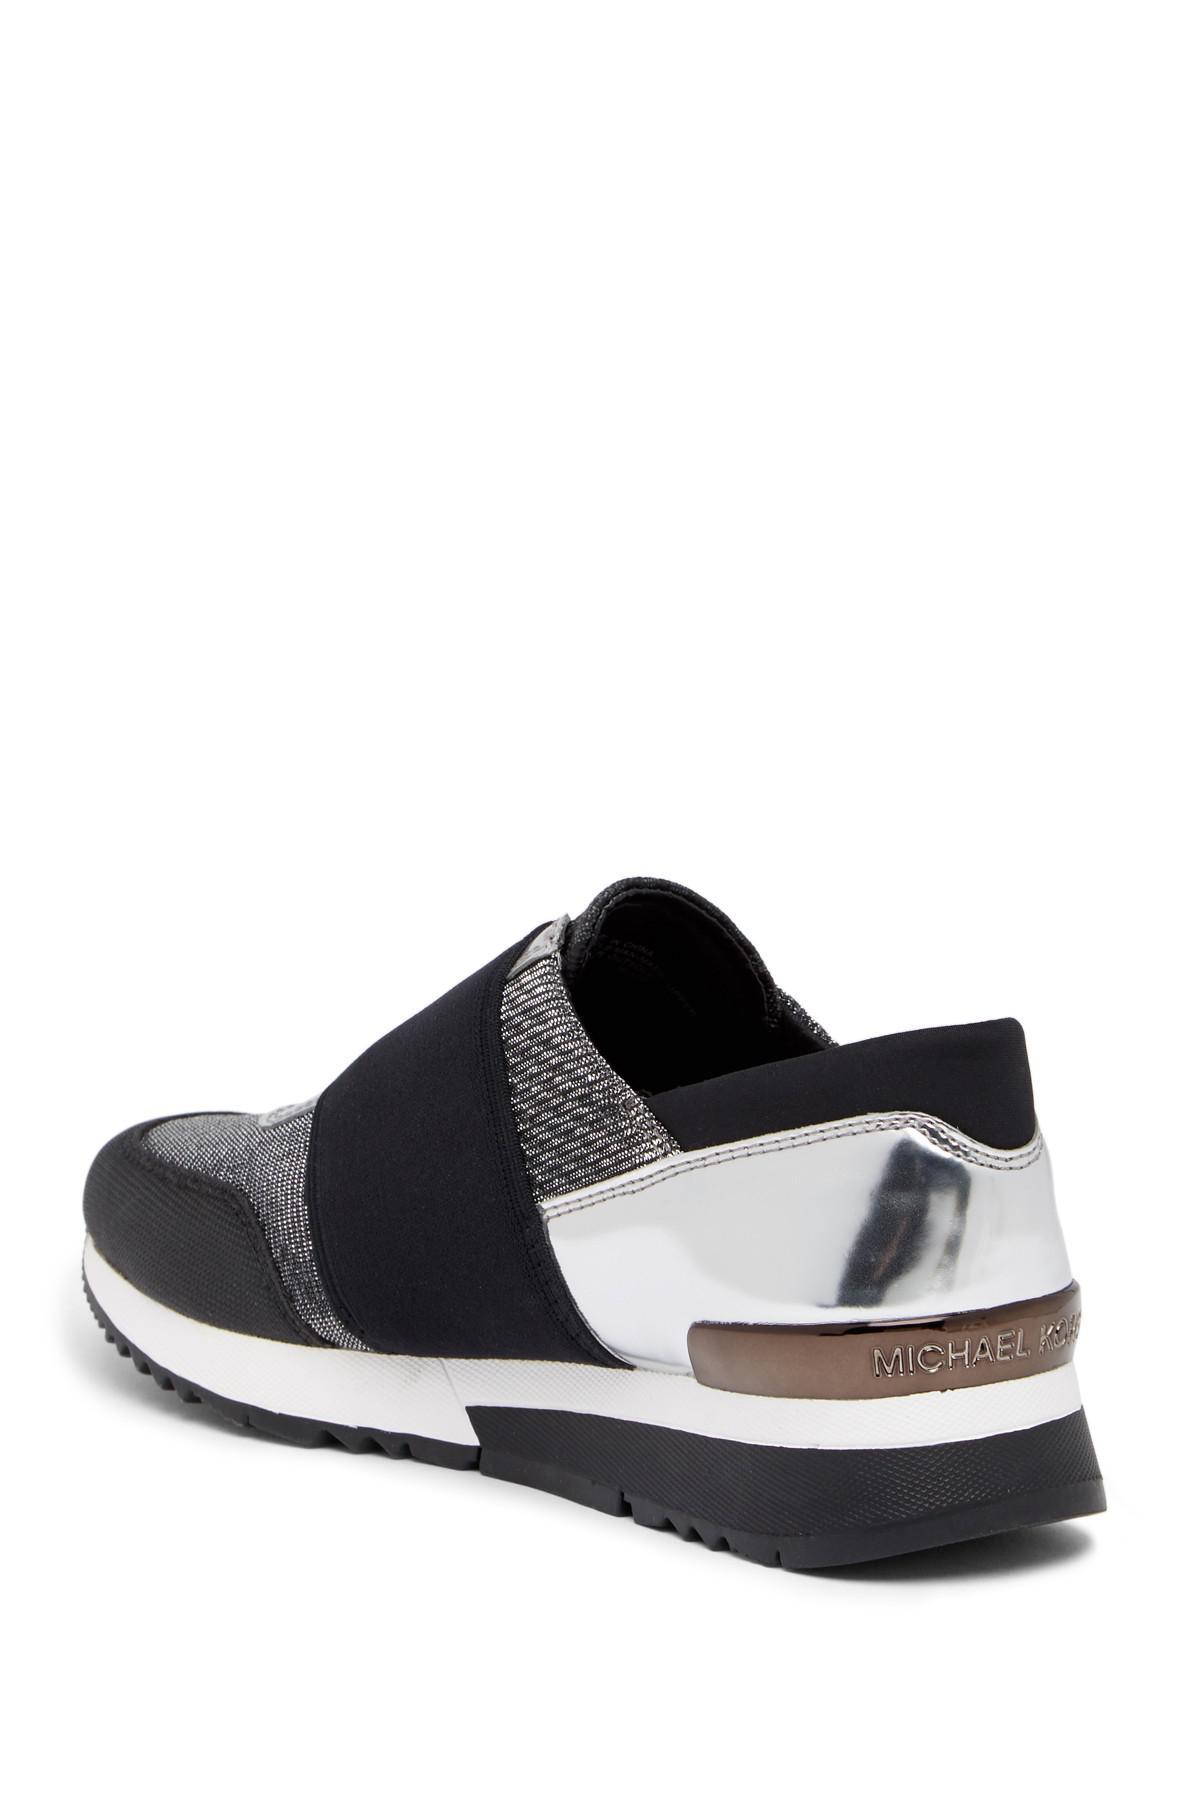 bc57f054aa68 Lyst - MICHAEL Michael Kors Mk Trainer Sneaker in Black